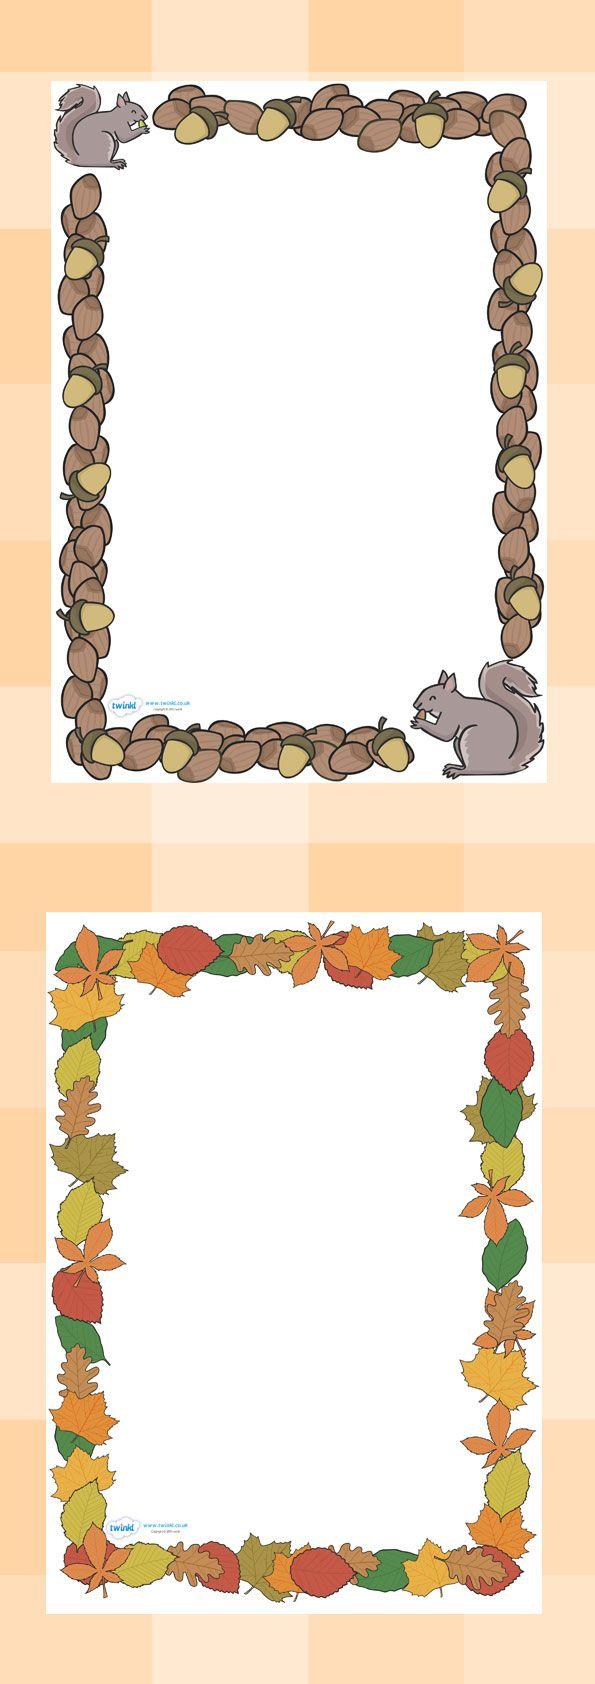 best frames borders. Cave clipart border